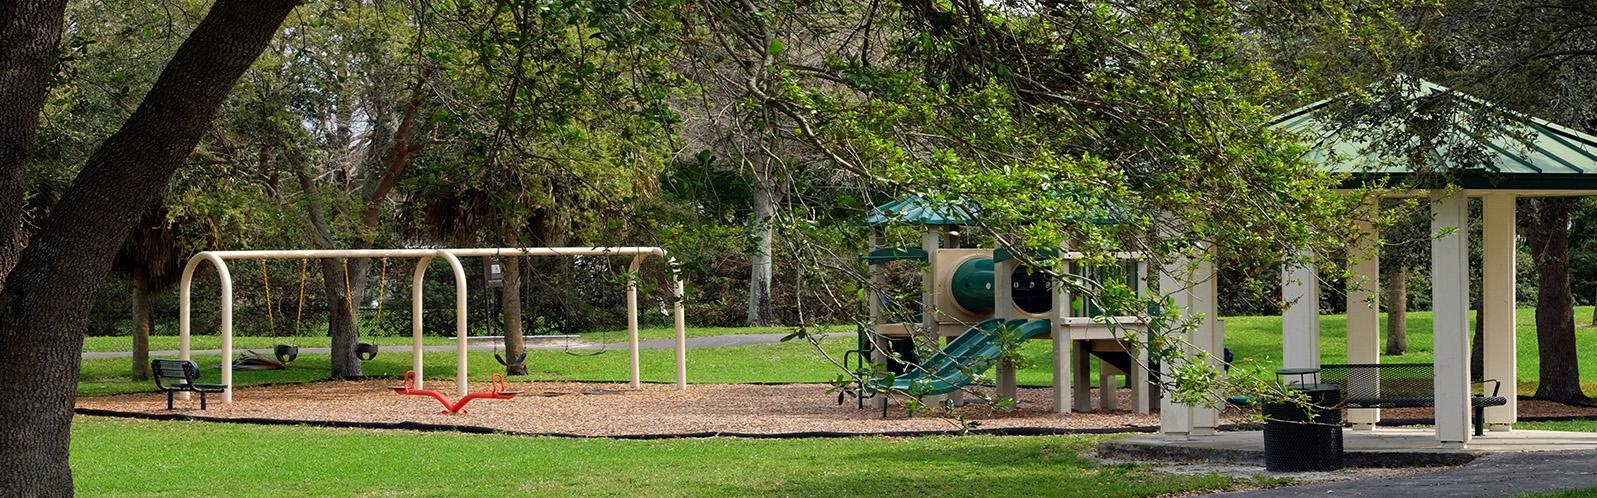 City Of Boynton Beach Parks And Rec